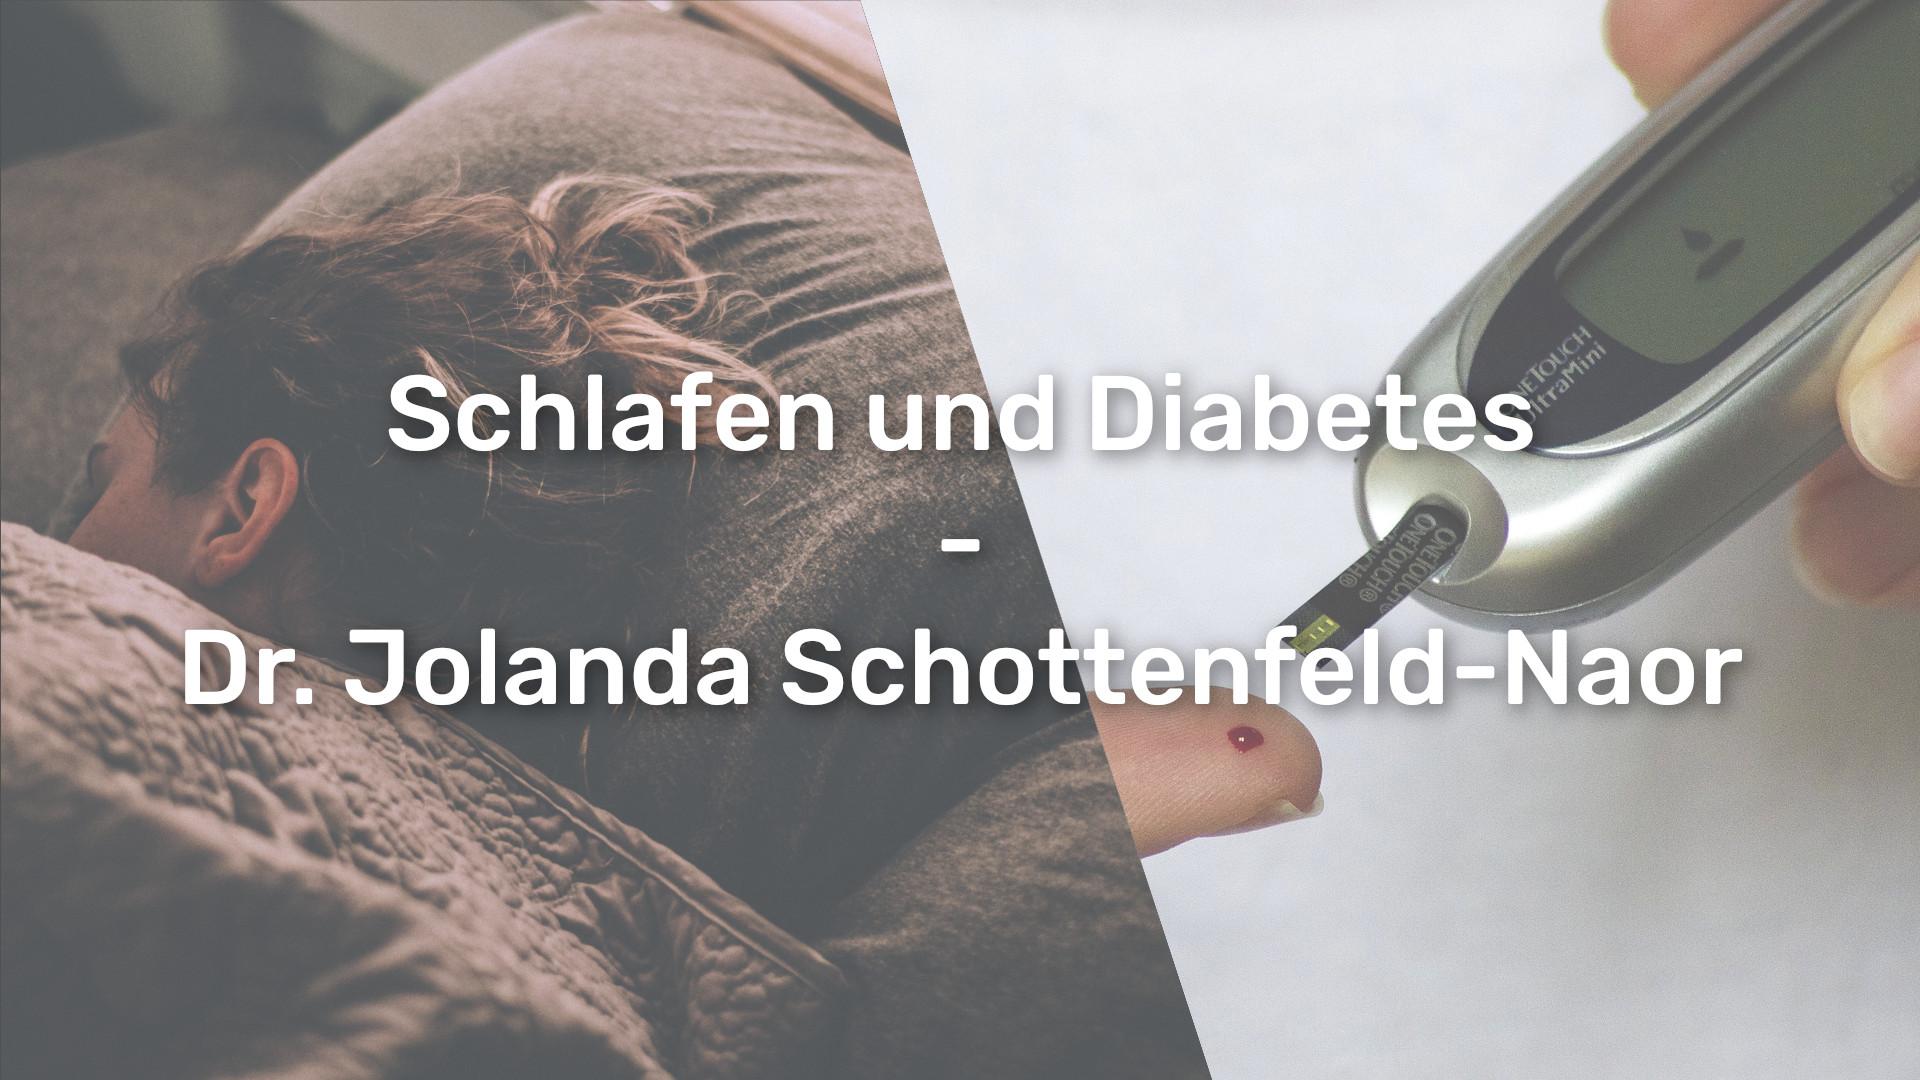 Düsseldorfer Diabetestag 2019 – Dr. Schottenfeld-Naor